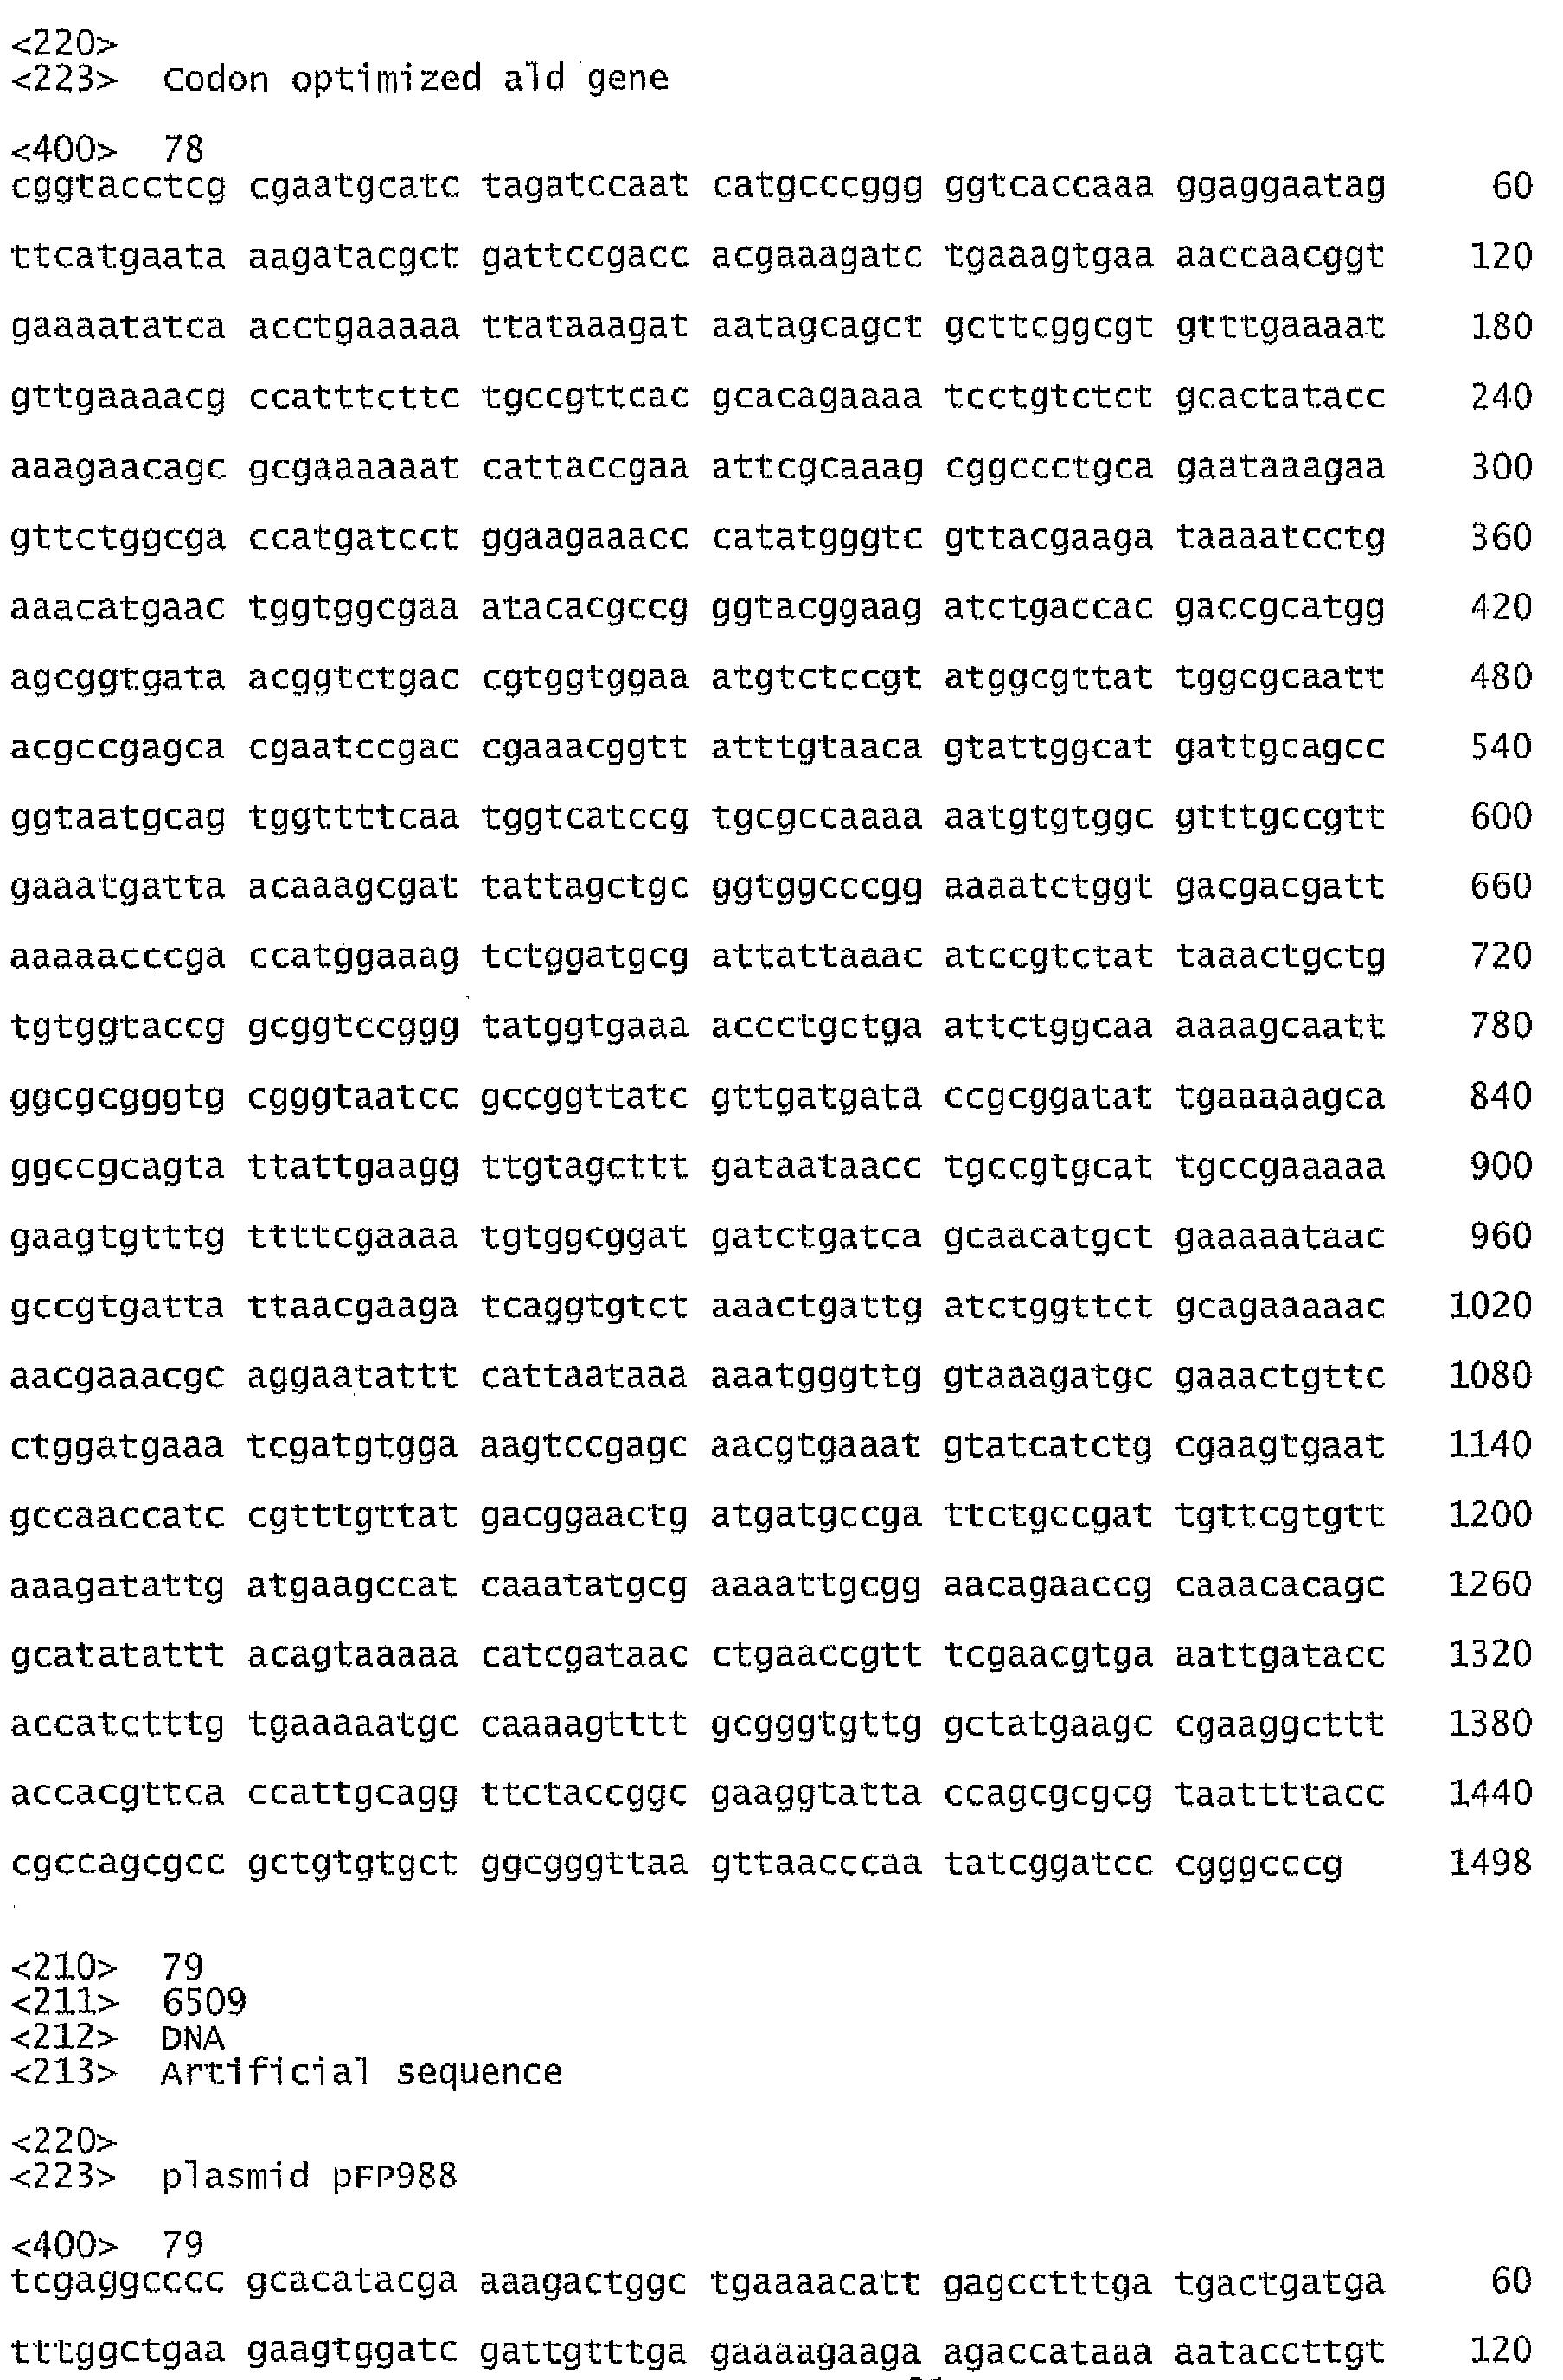 Figure imgb0125